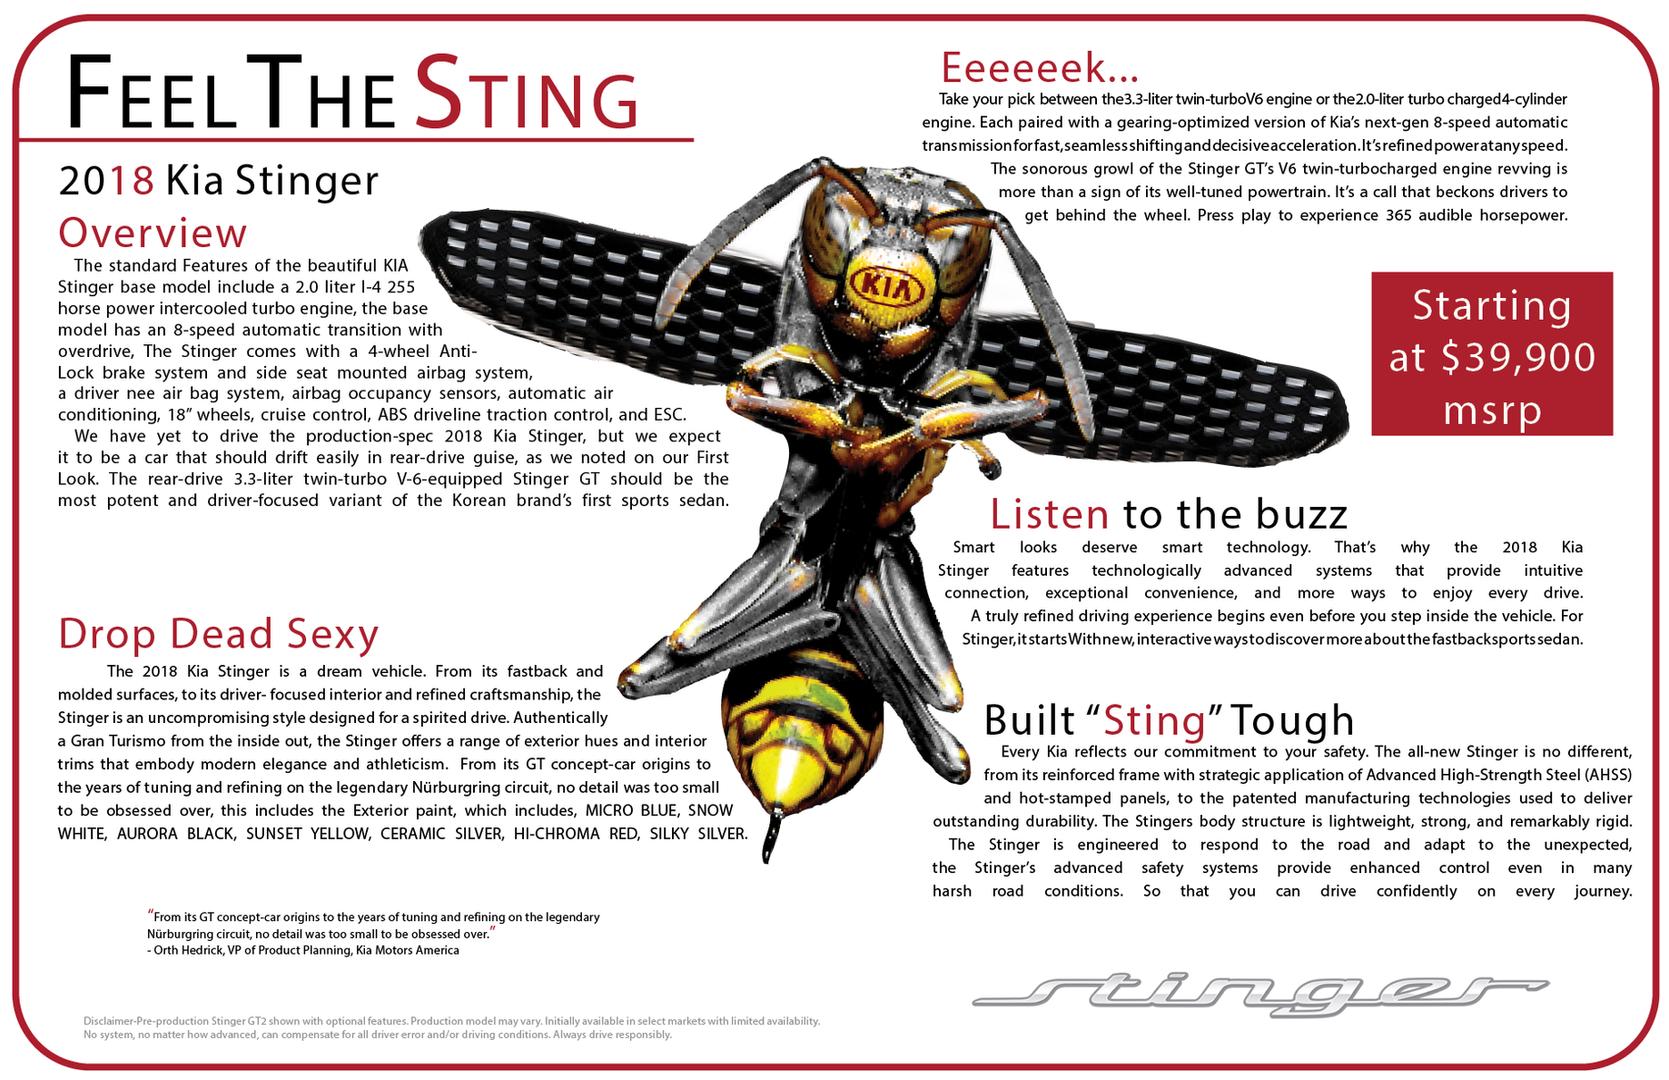 Stinger_Ad.png